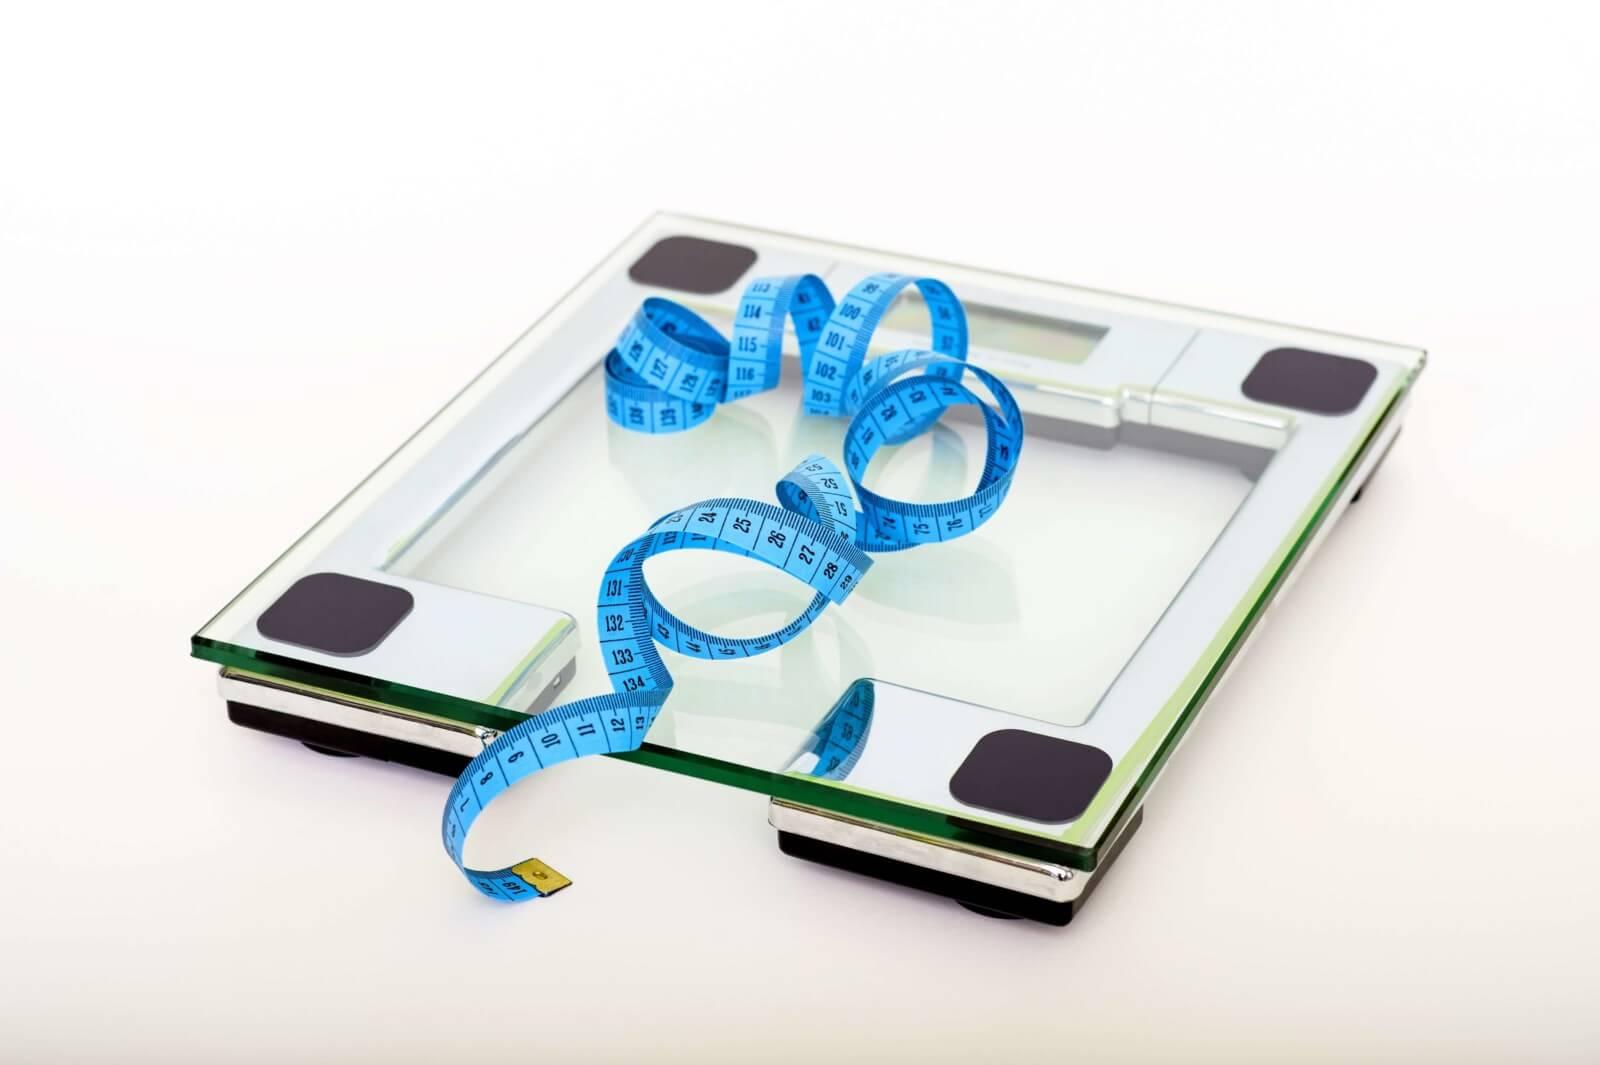 лечение дефицита массы тела